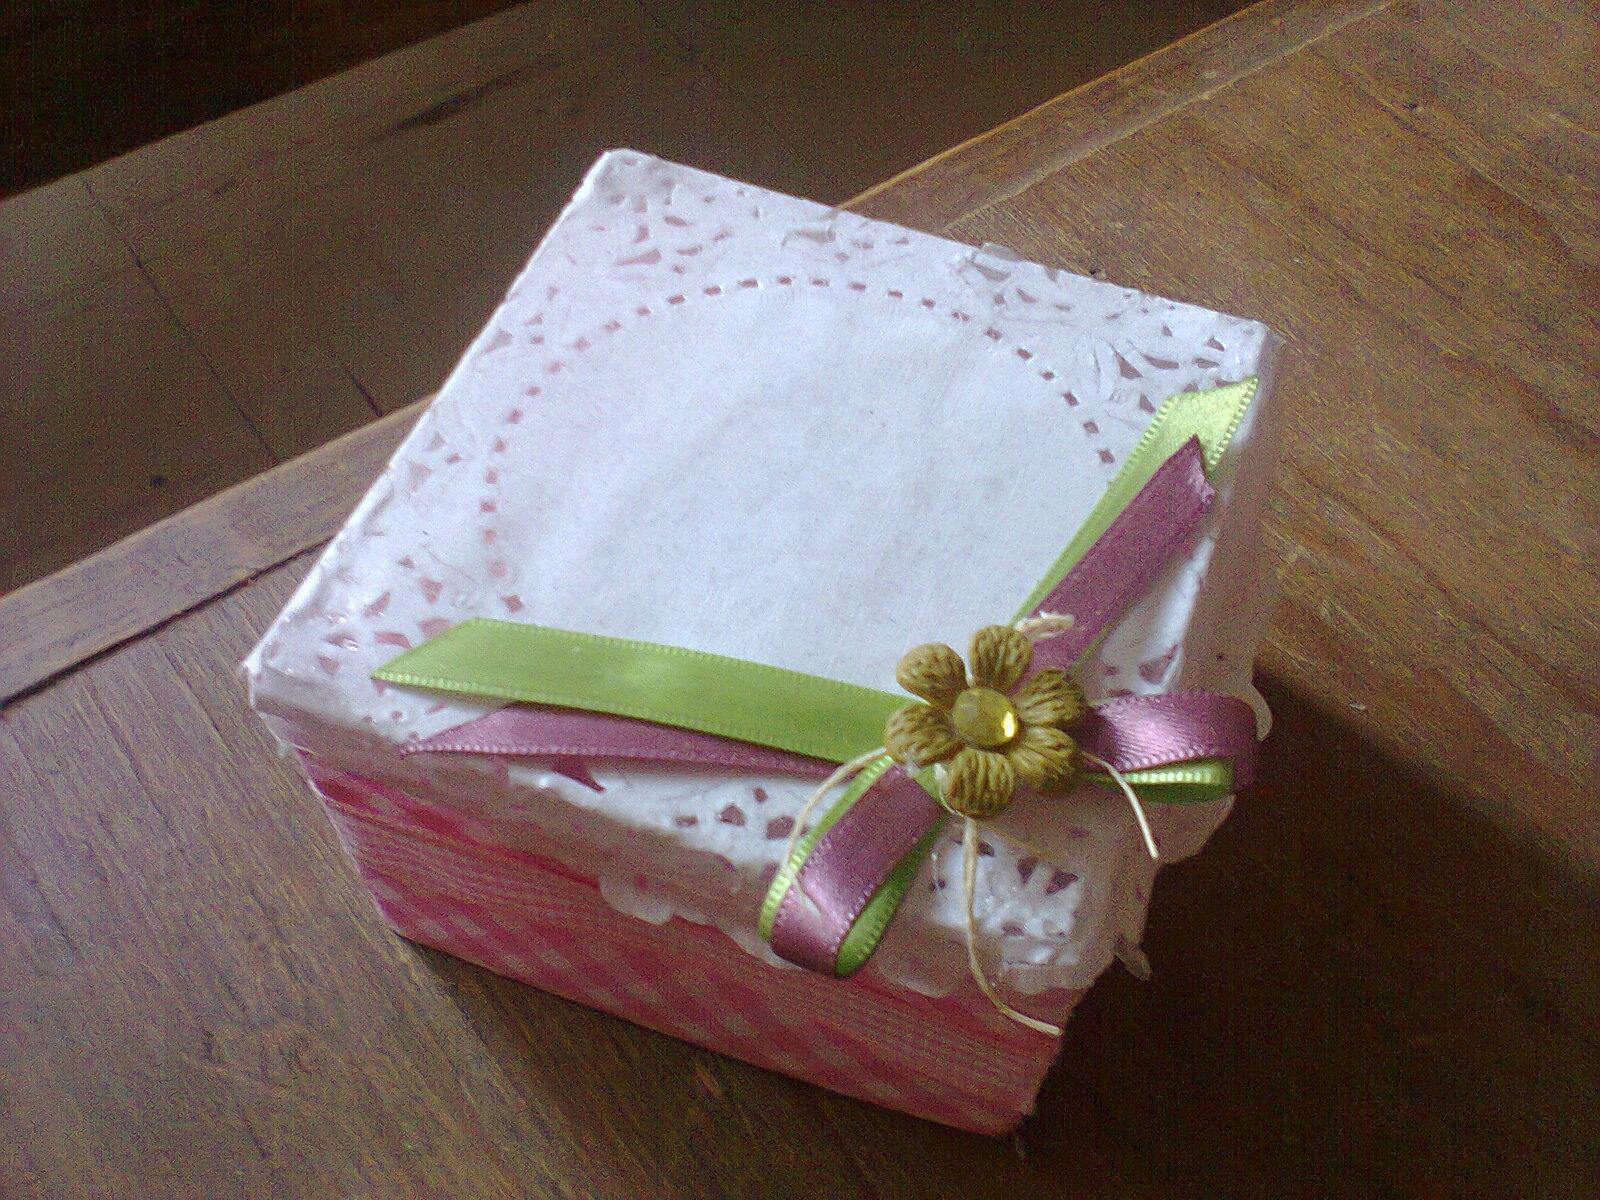 Cositis decoraci n de cajas multiusos for Decoracion de cajas